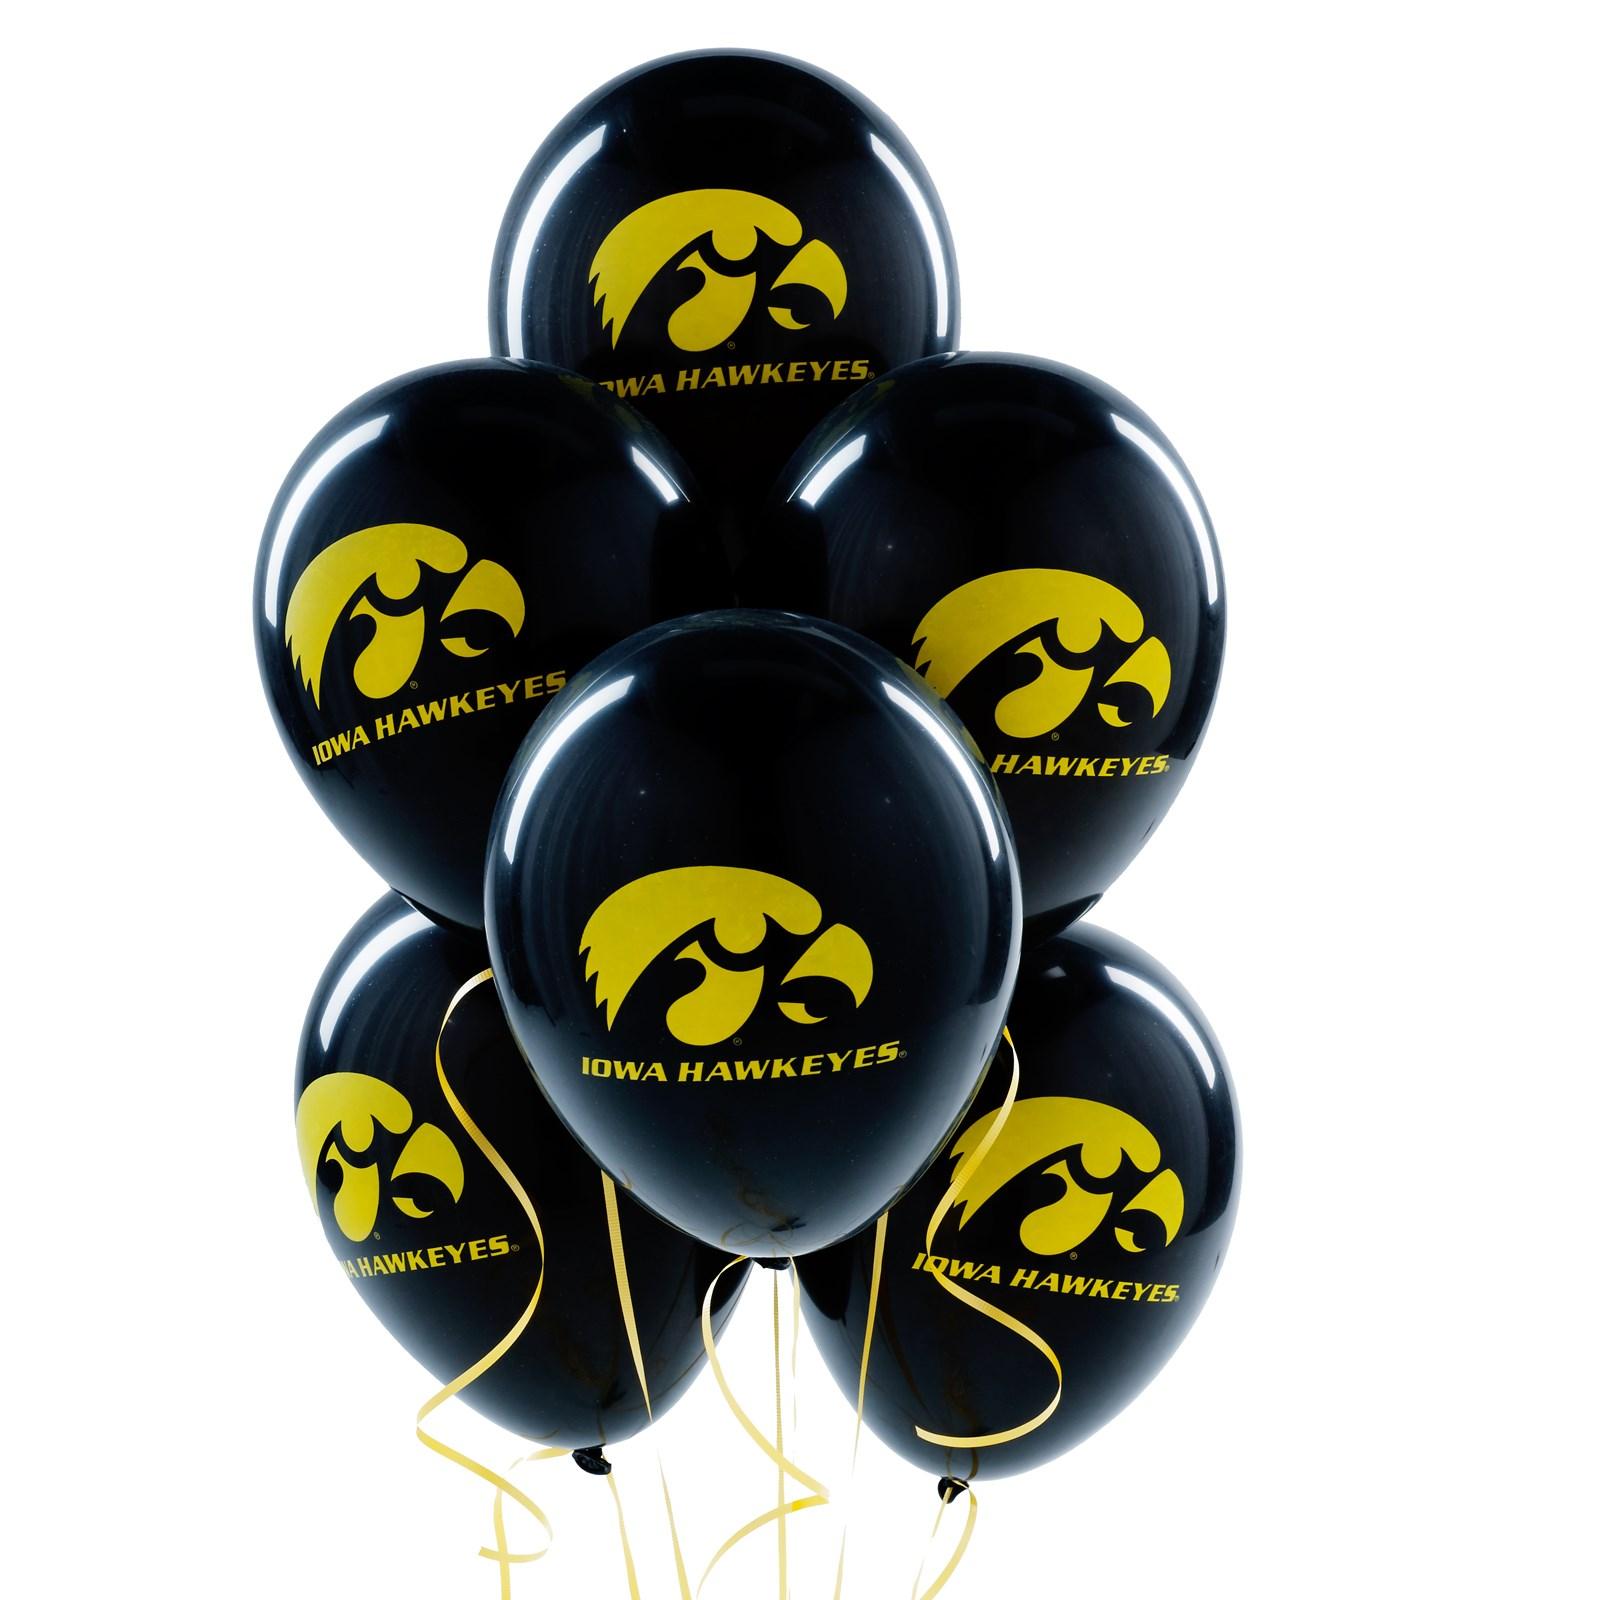 Image of Iowa Hawkeyes Latex Balloons